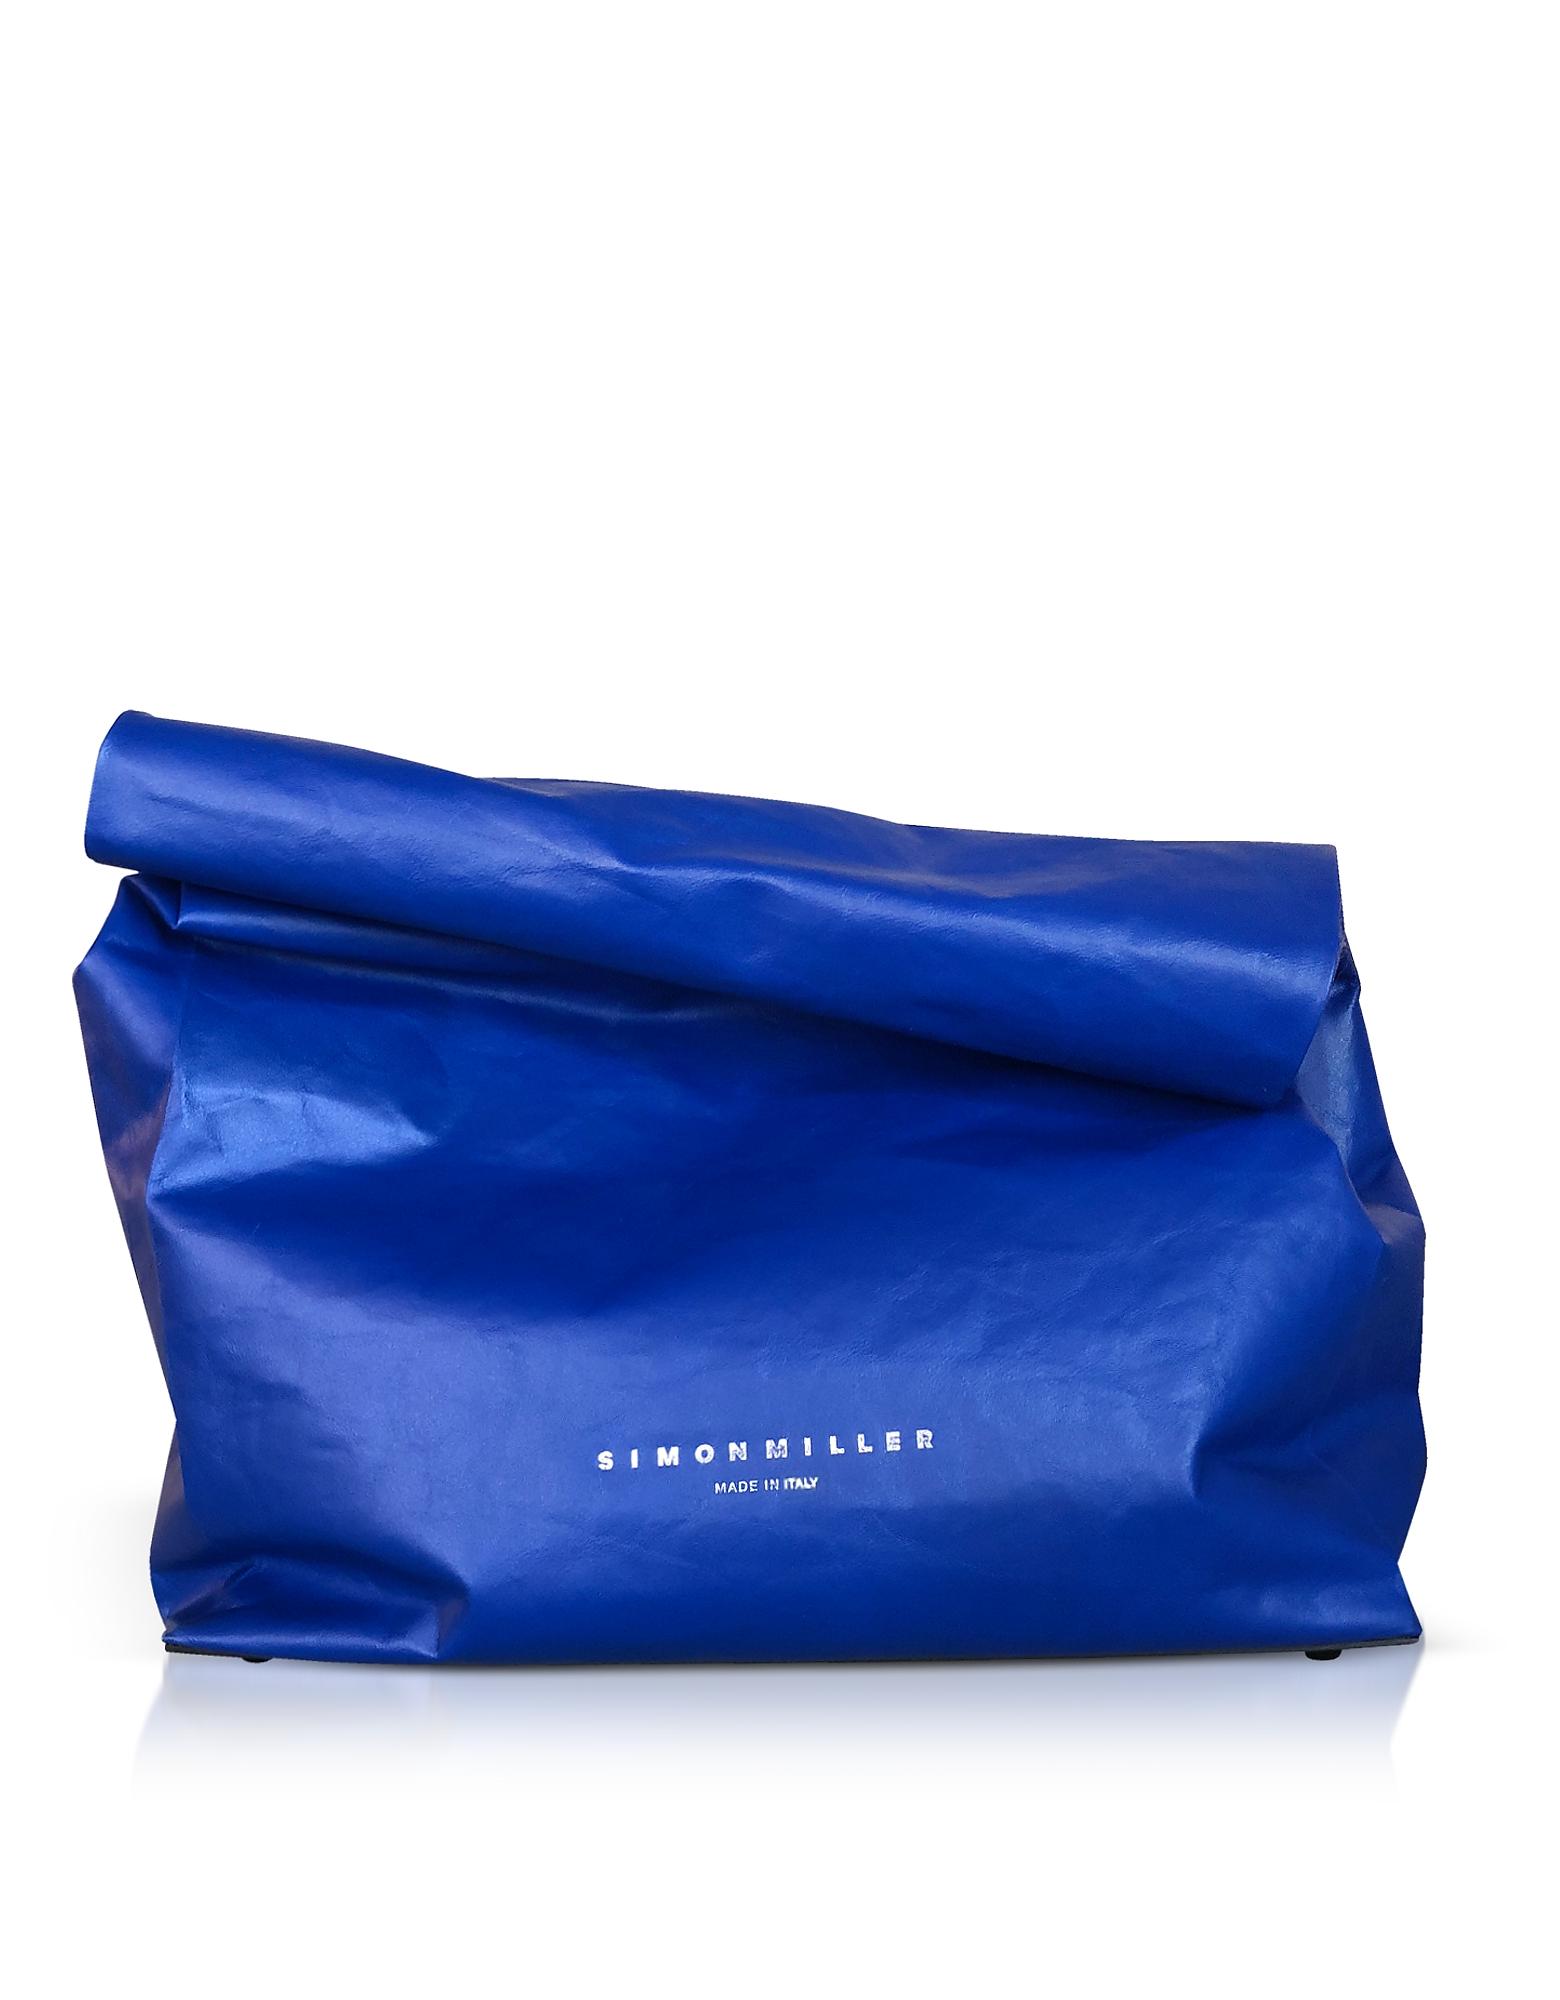 Image of Simon Miller Designer Handbags, XL Cobalt Leather 30cm Lunch Bag